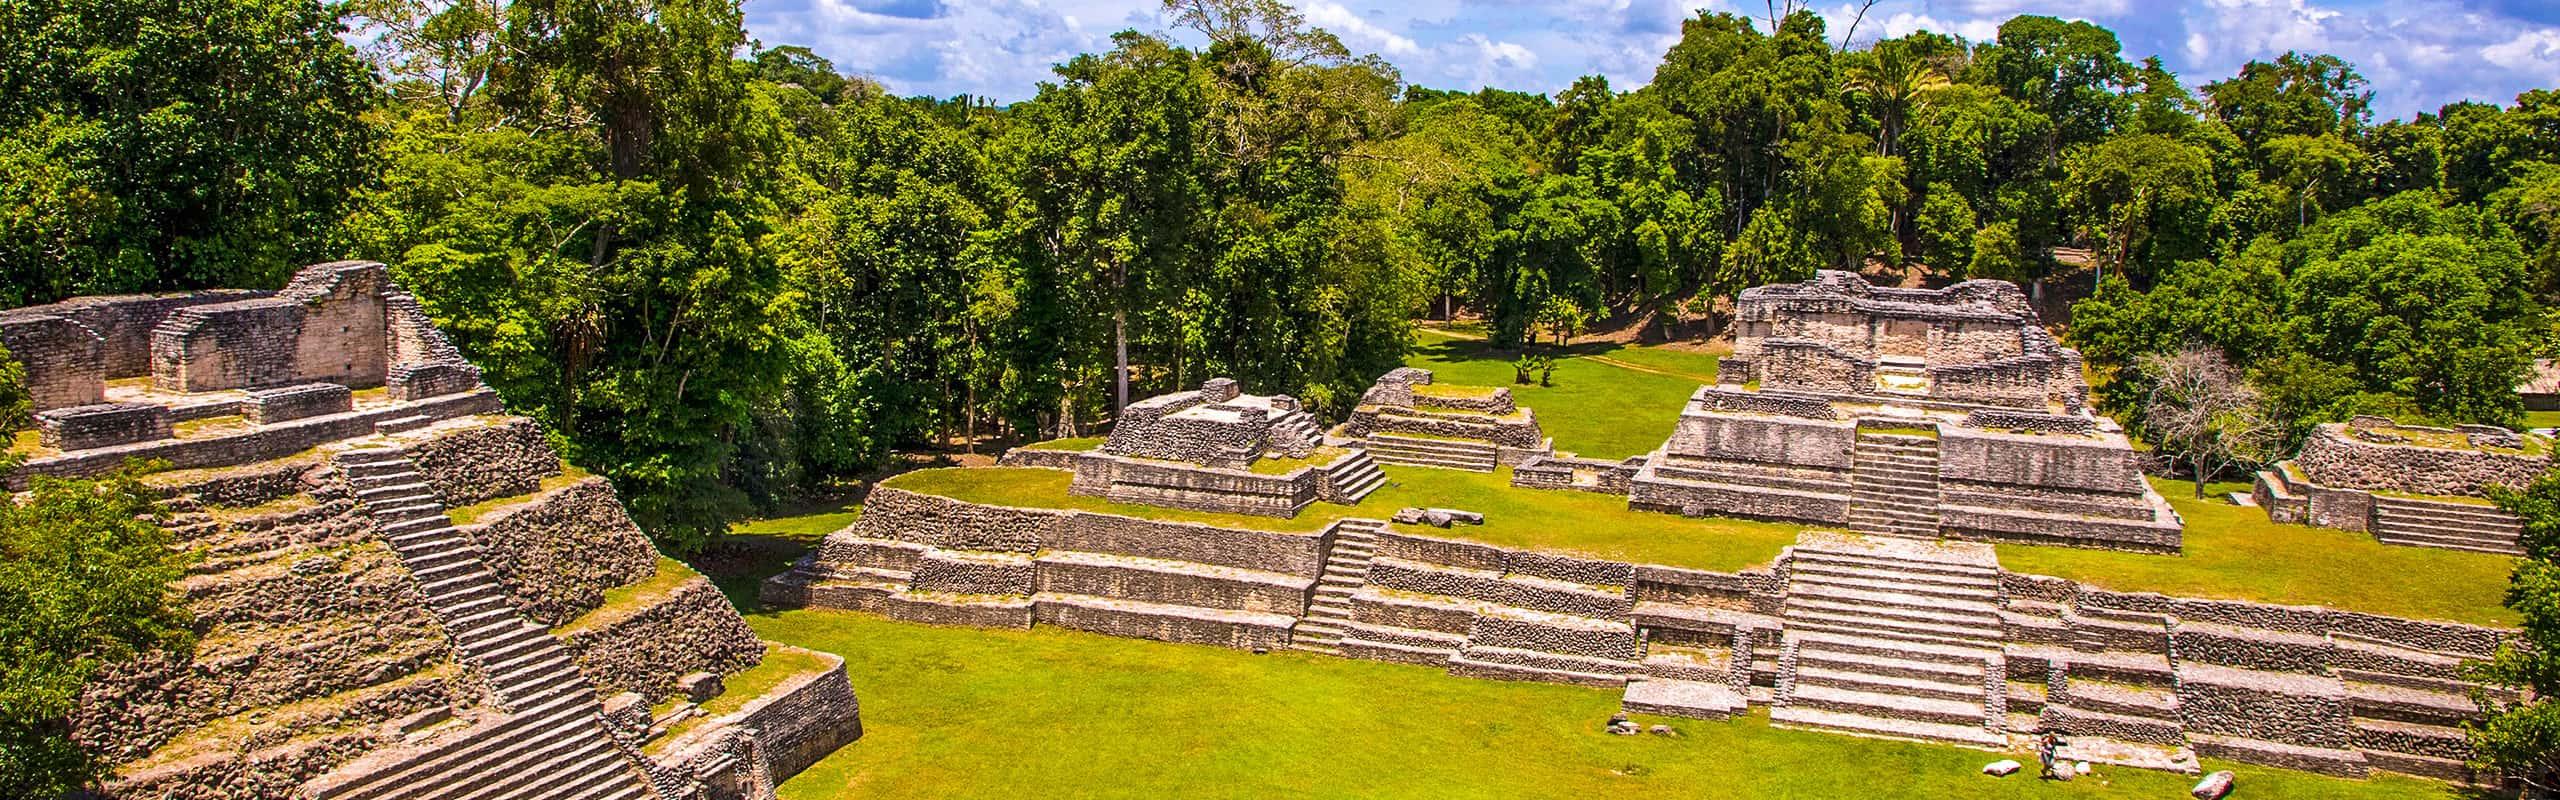 Caracol Maya Ruins,Belize